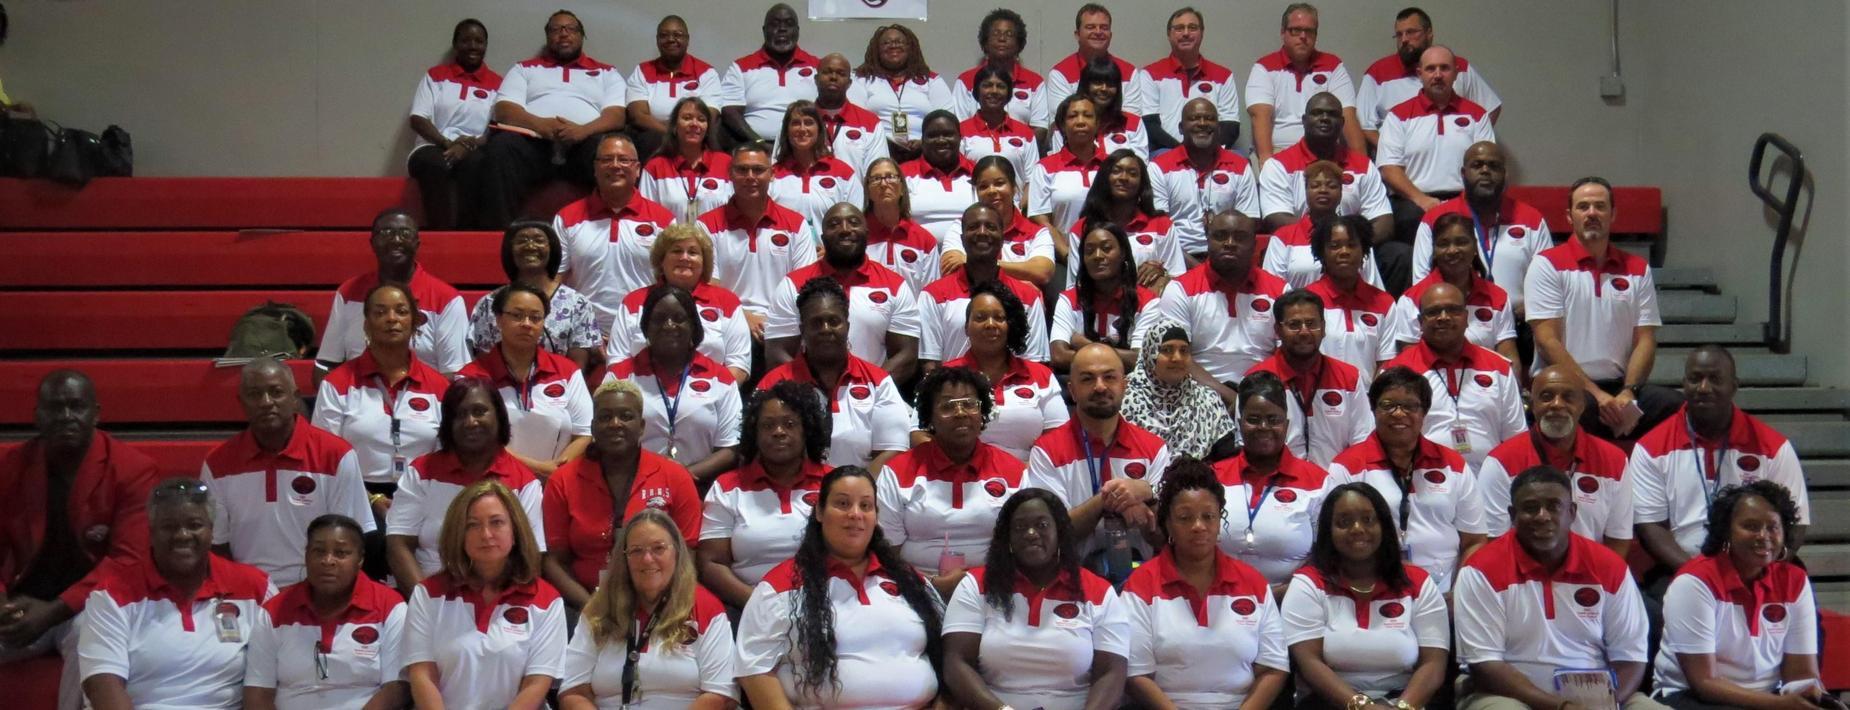 Ridgeland-Hardeeville High Staff photo